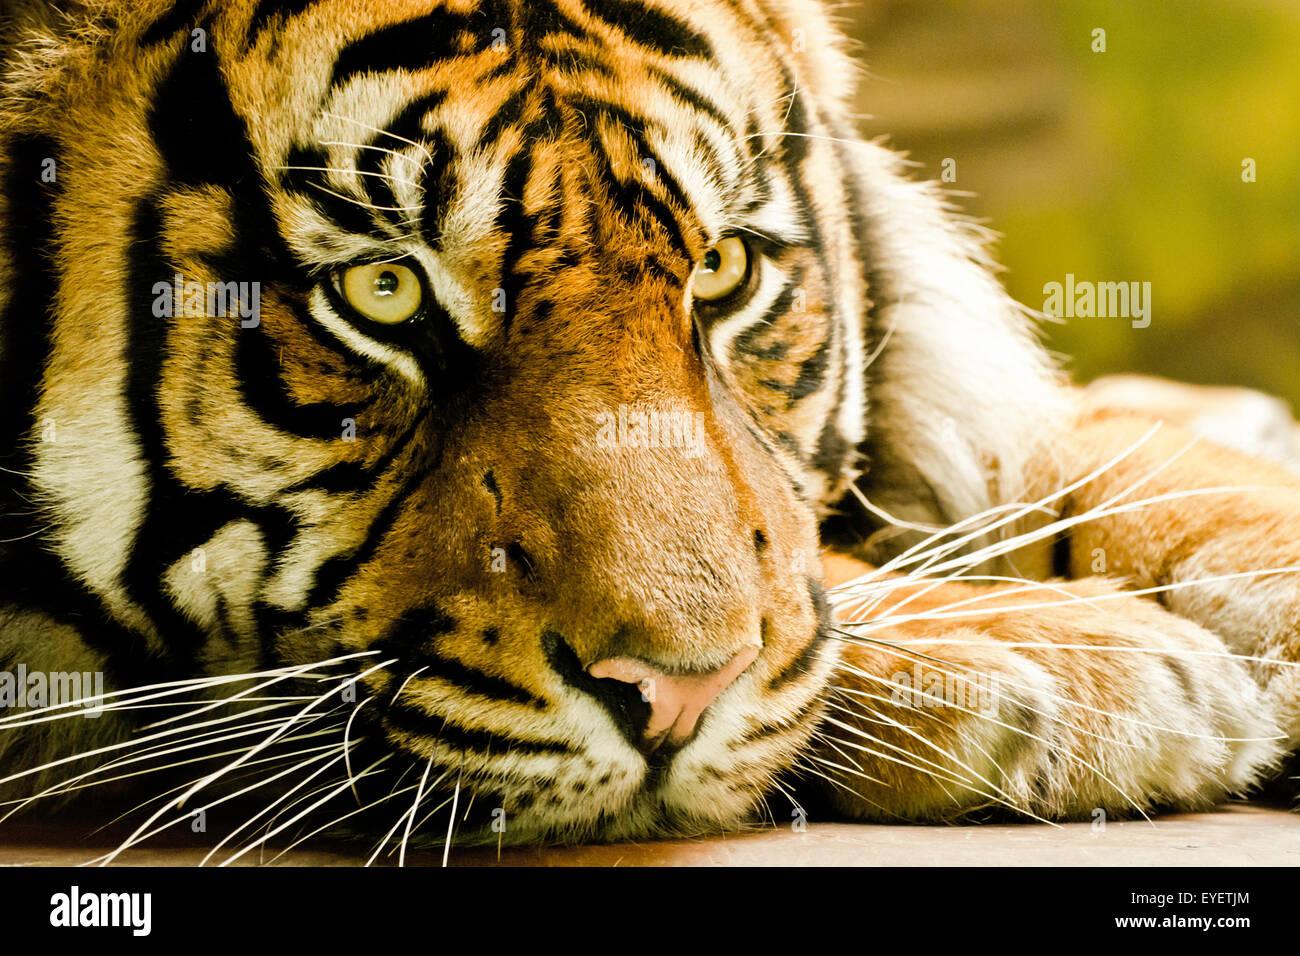 Sumatran tiger portrait in captivity - Stock Image